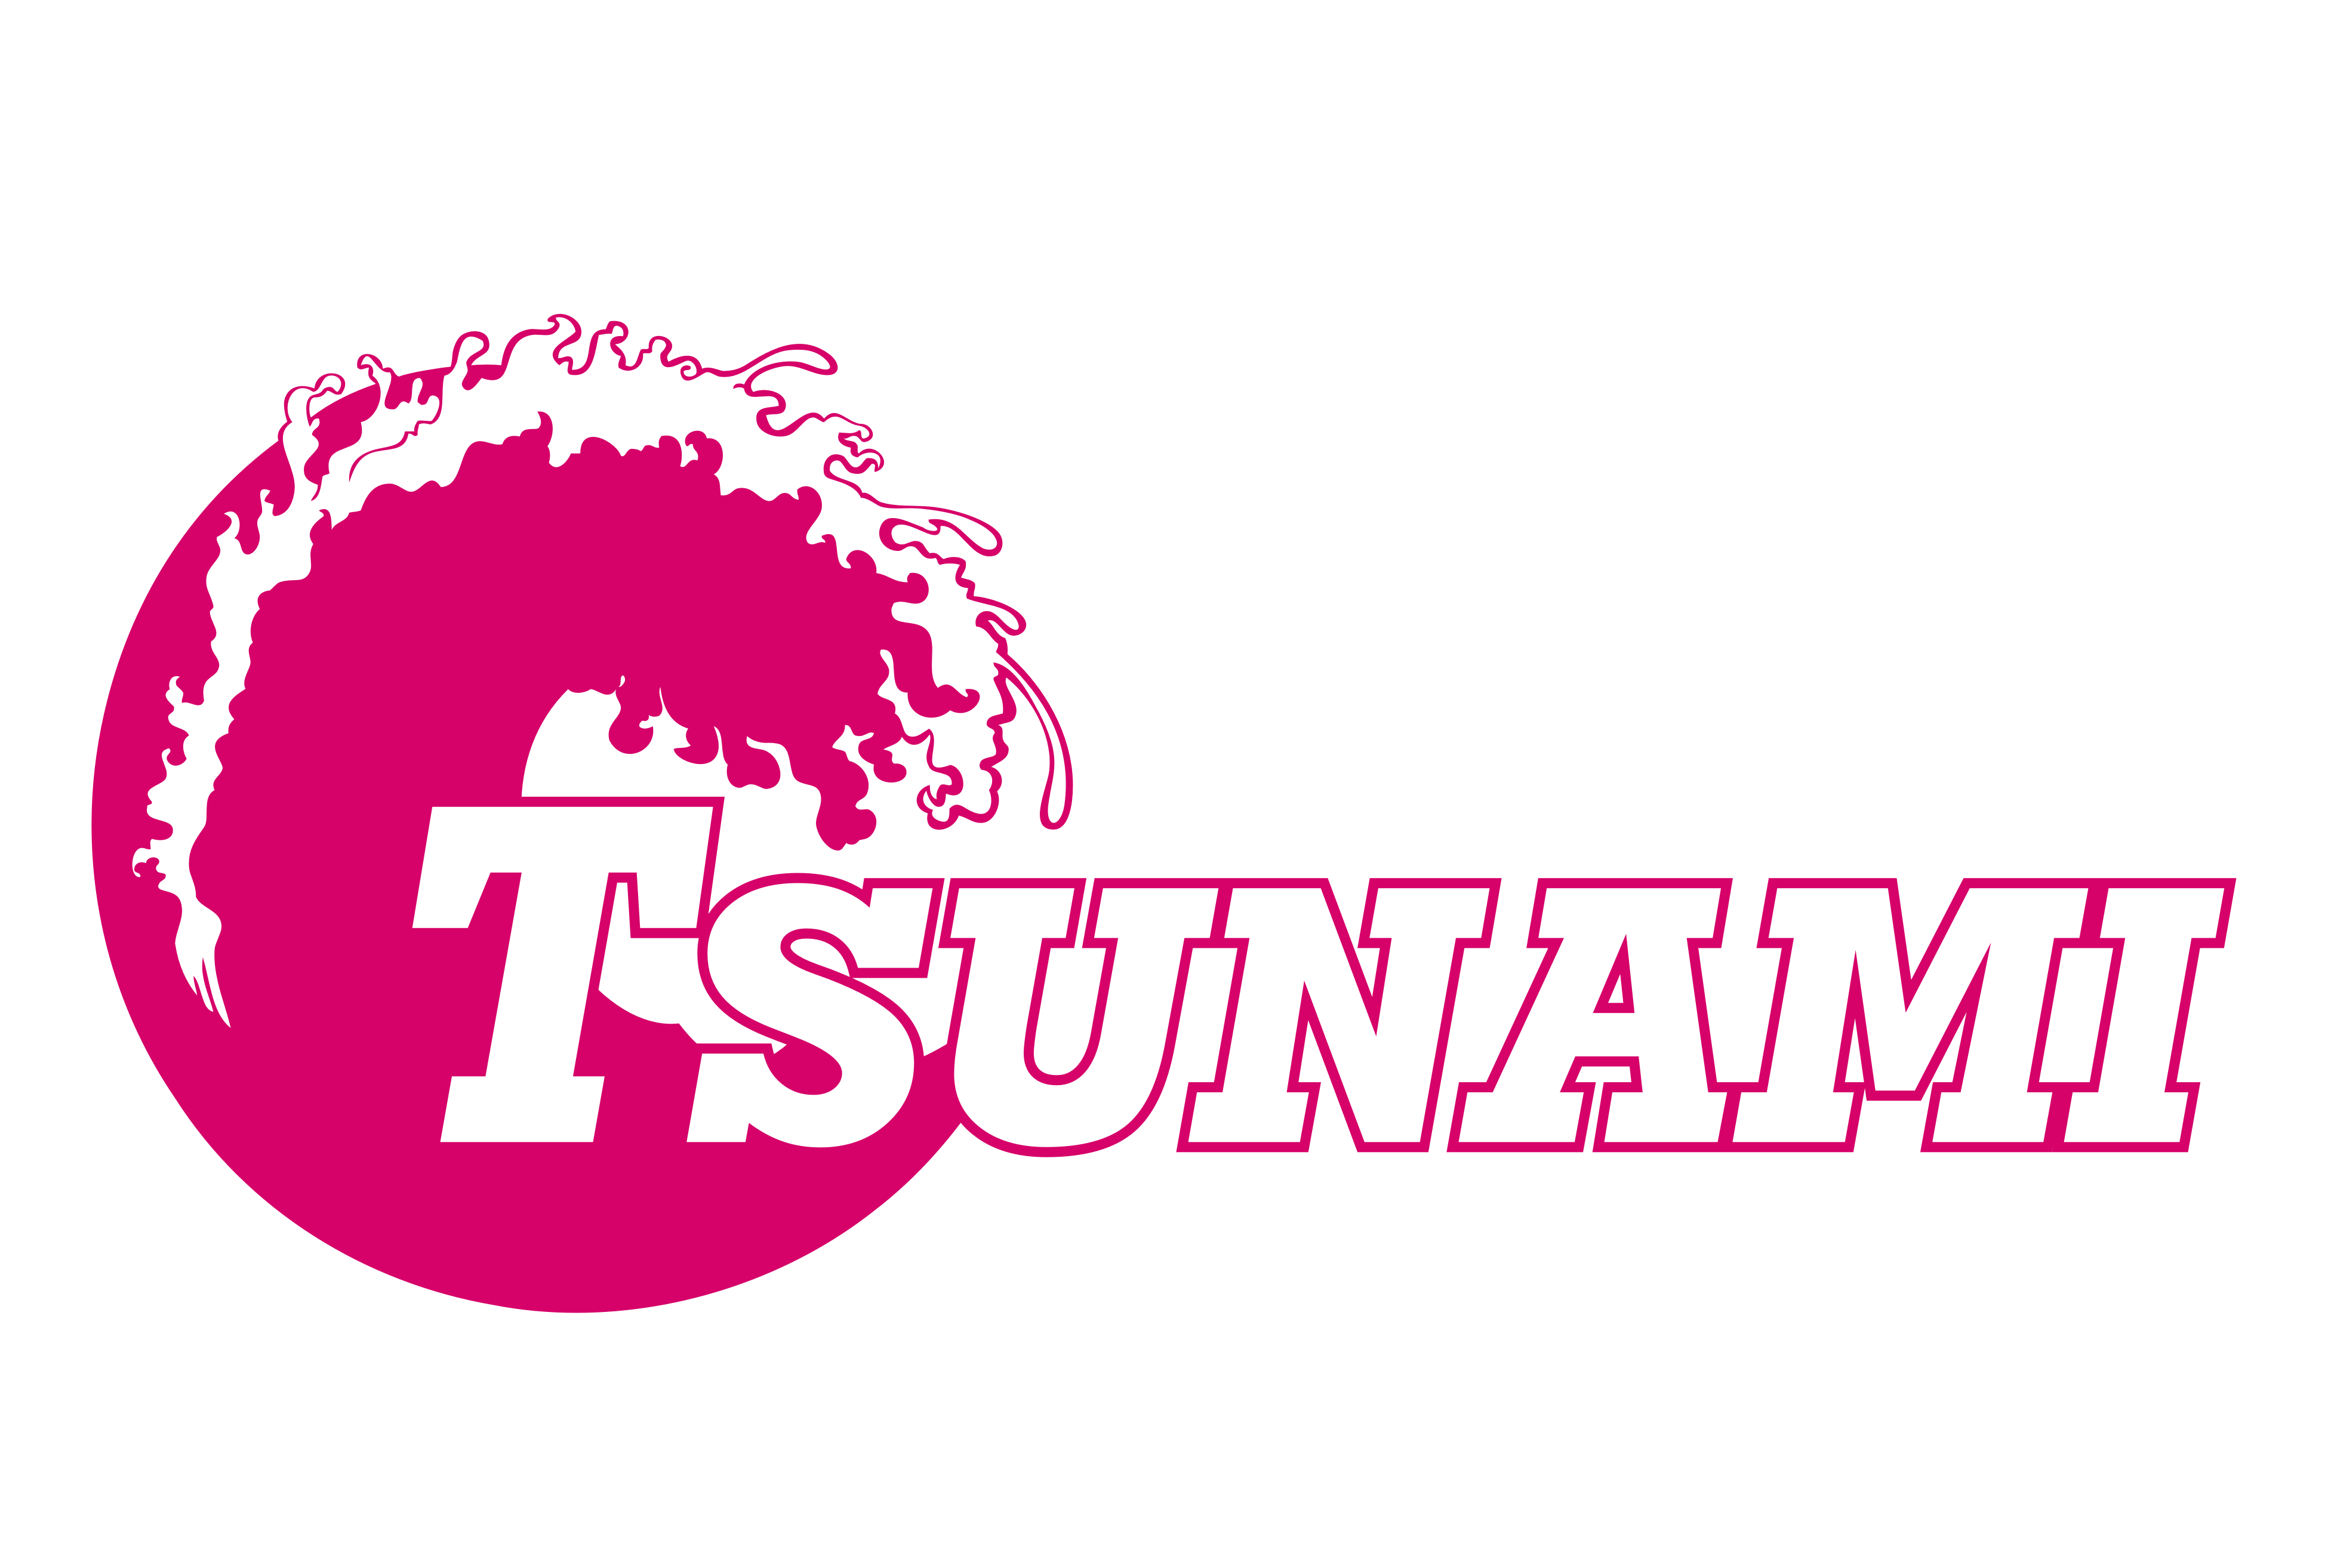 Somerville Tsunami 10B